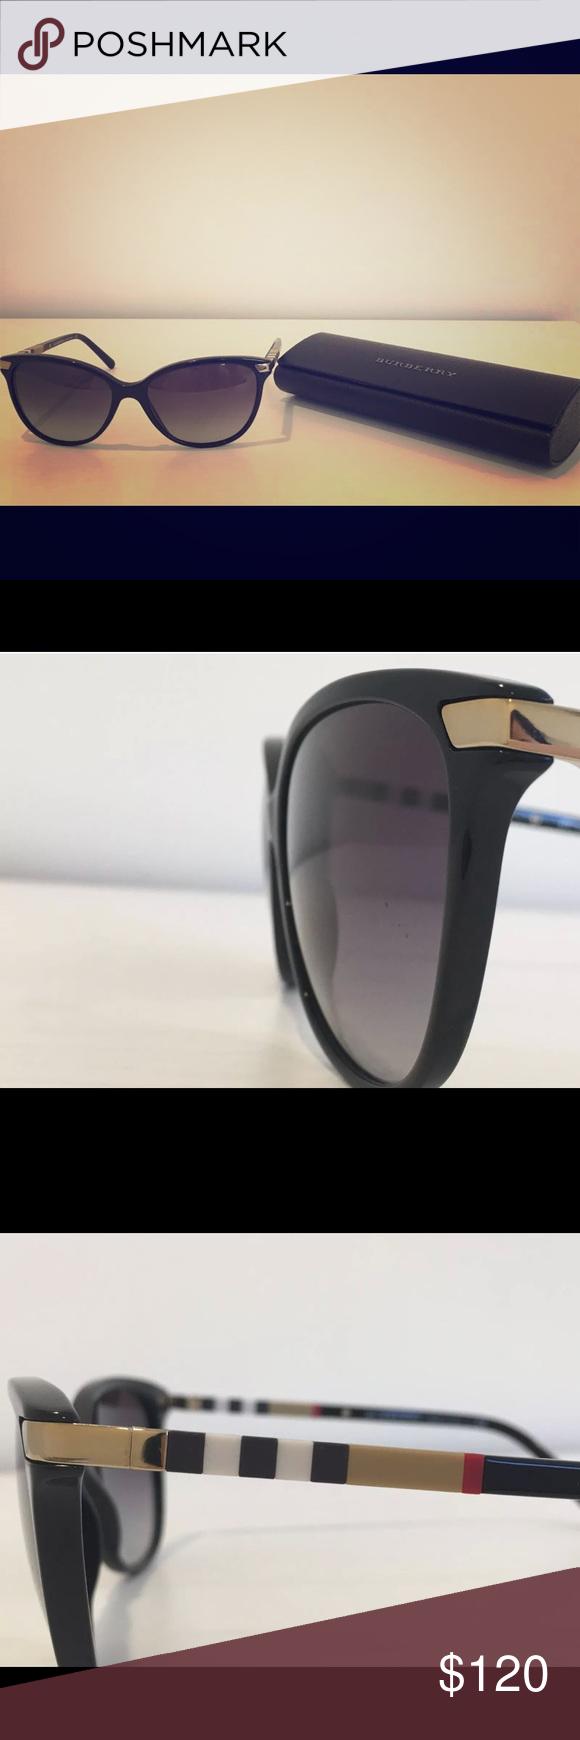 cb412e0d0e57 Authentic  Burberry women s sunglasses Brand NEW AUTHENTIC! Burberry B 4216  3001 8G Women Sunglasses Black Tartan Gradient A1 16 Never worn or used  still in ...